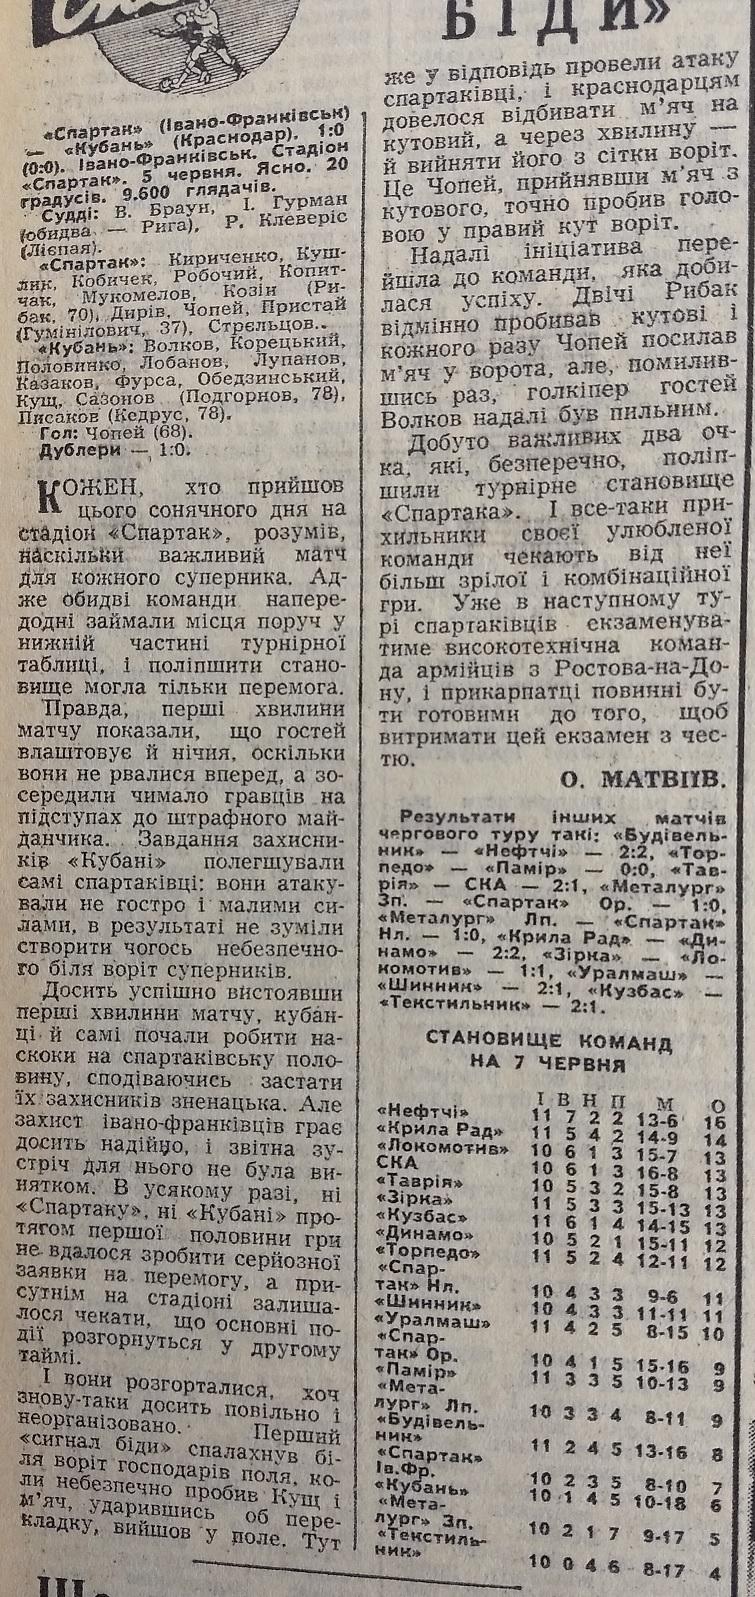 Спартак (Ивано-Франковск) - Кубань (Краснодар) 1:0